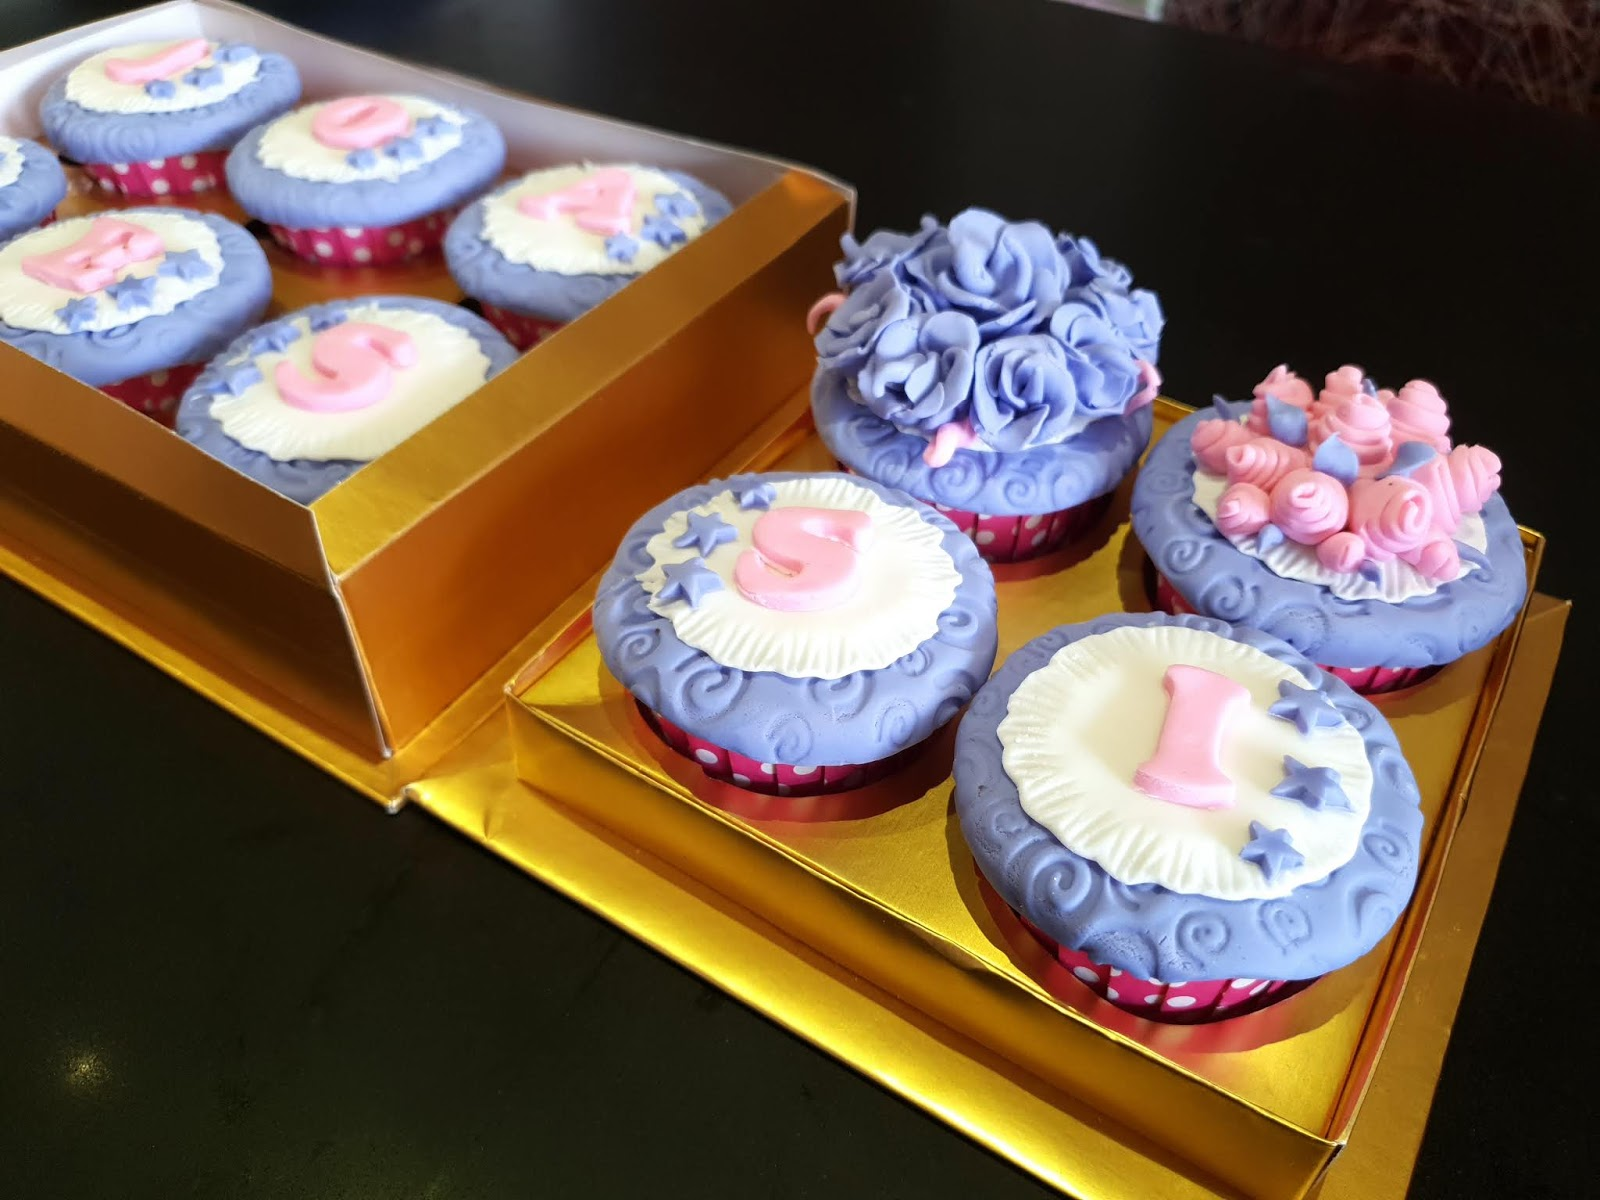 Cup Cake Cirebon, Kue Mangkok Cirebon, Toko Kue Cirebon, Cake Shop Cirebon, Bakery Cirebon